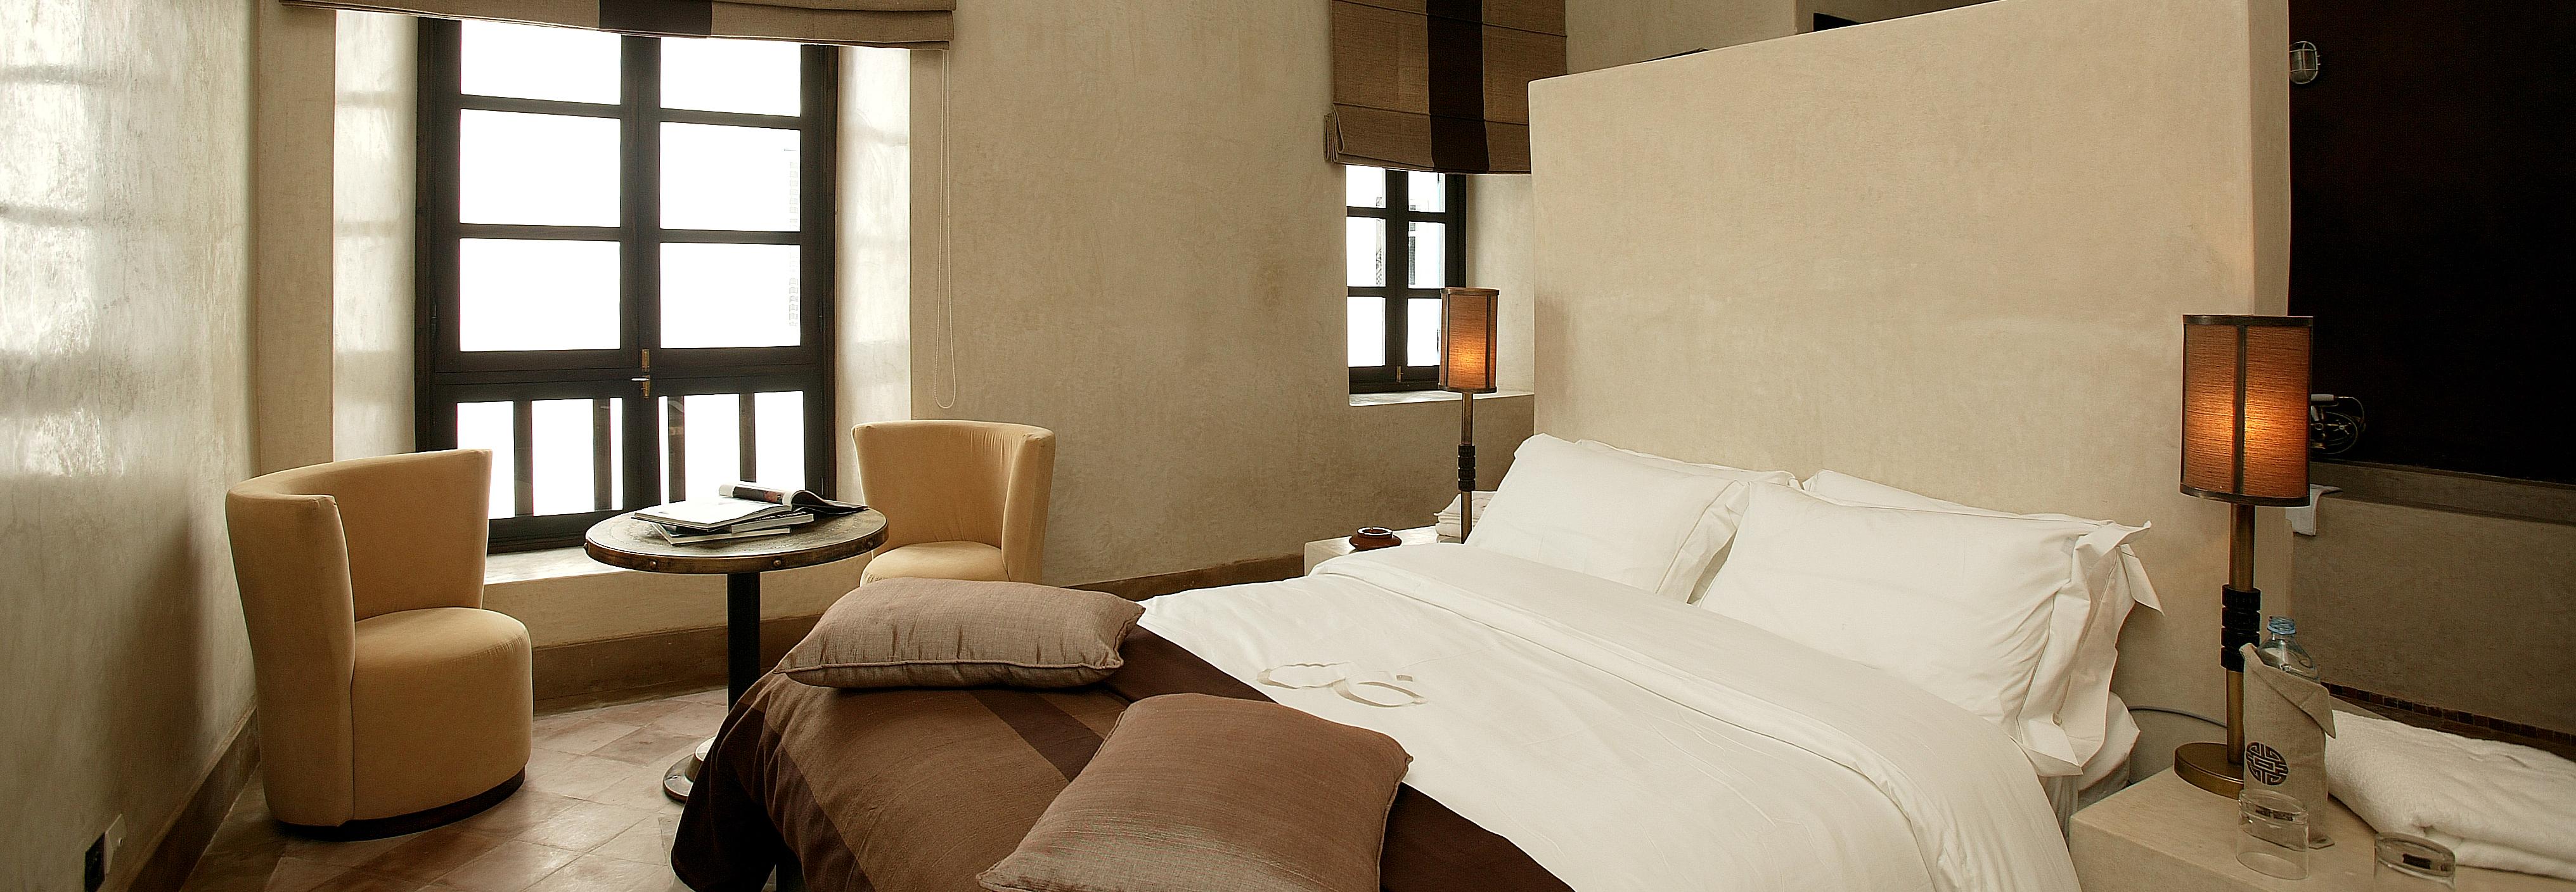 madada-mogador-standard-room